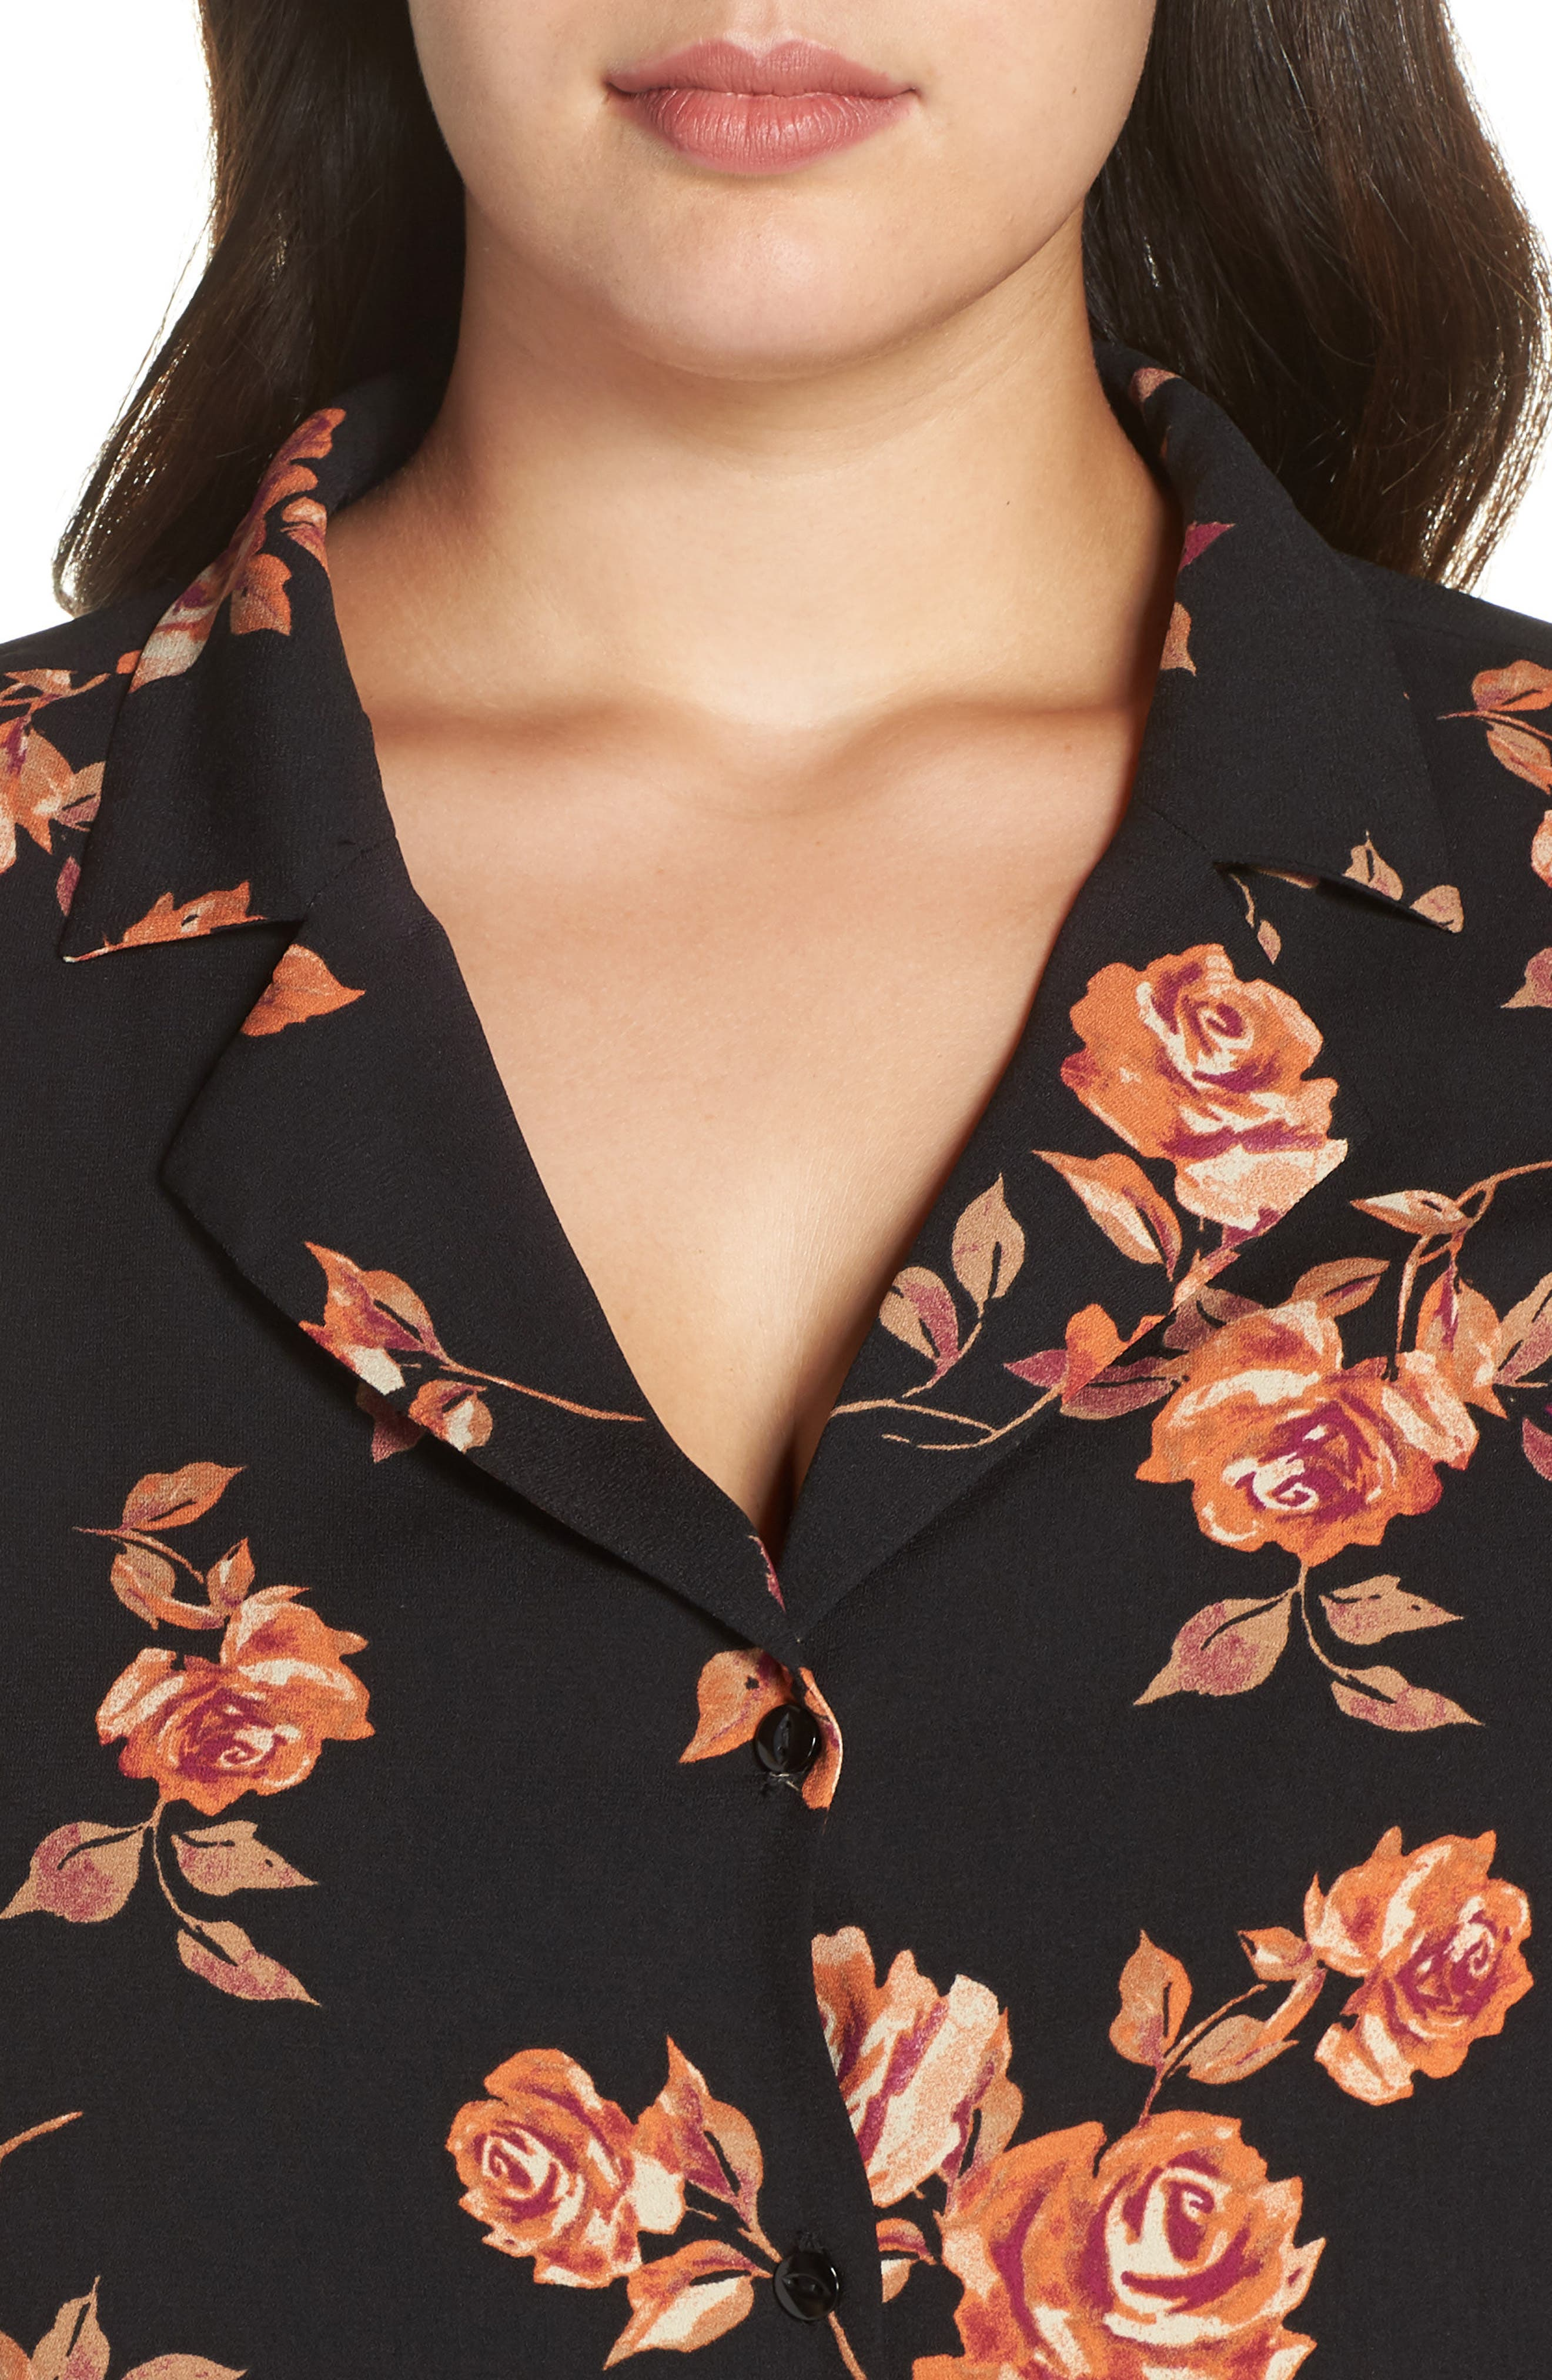 Notched Collar Floral Print Shirt,                             Alternate thumbnail 4, color,                             BLACK POP FLORAL